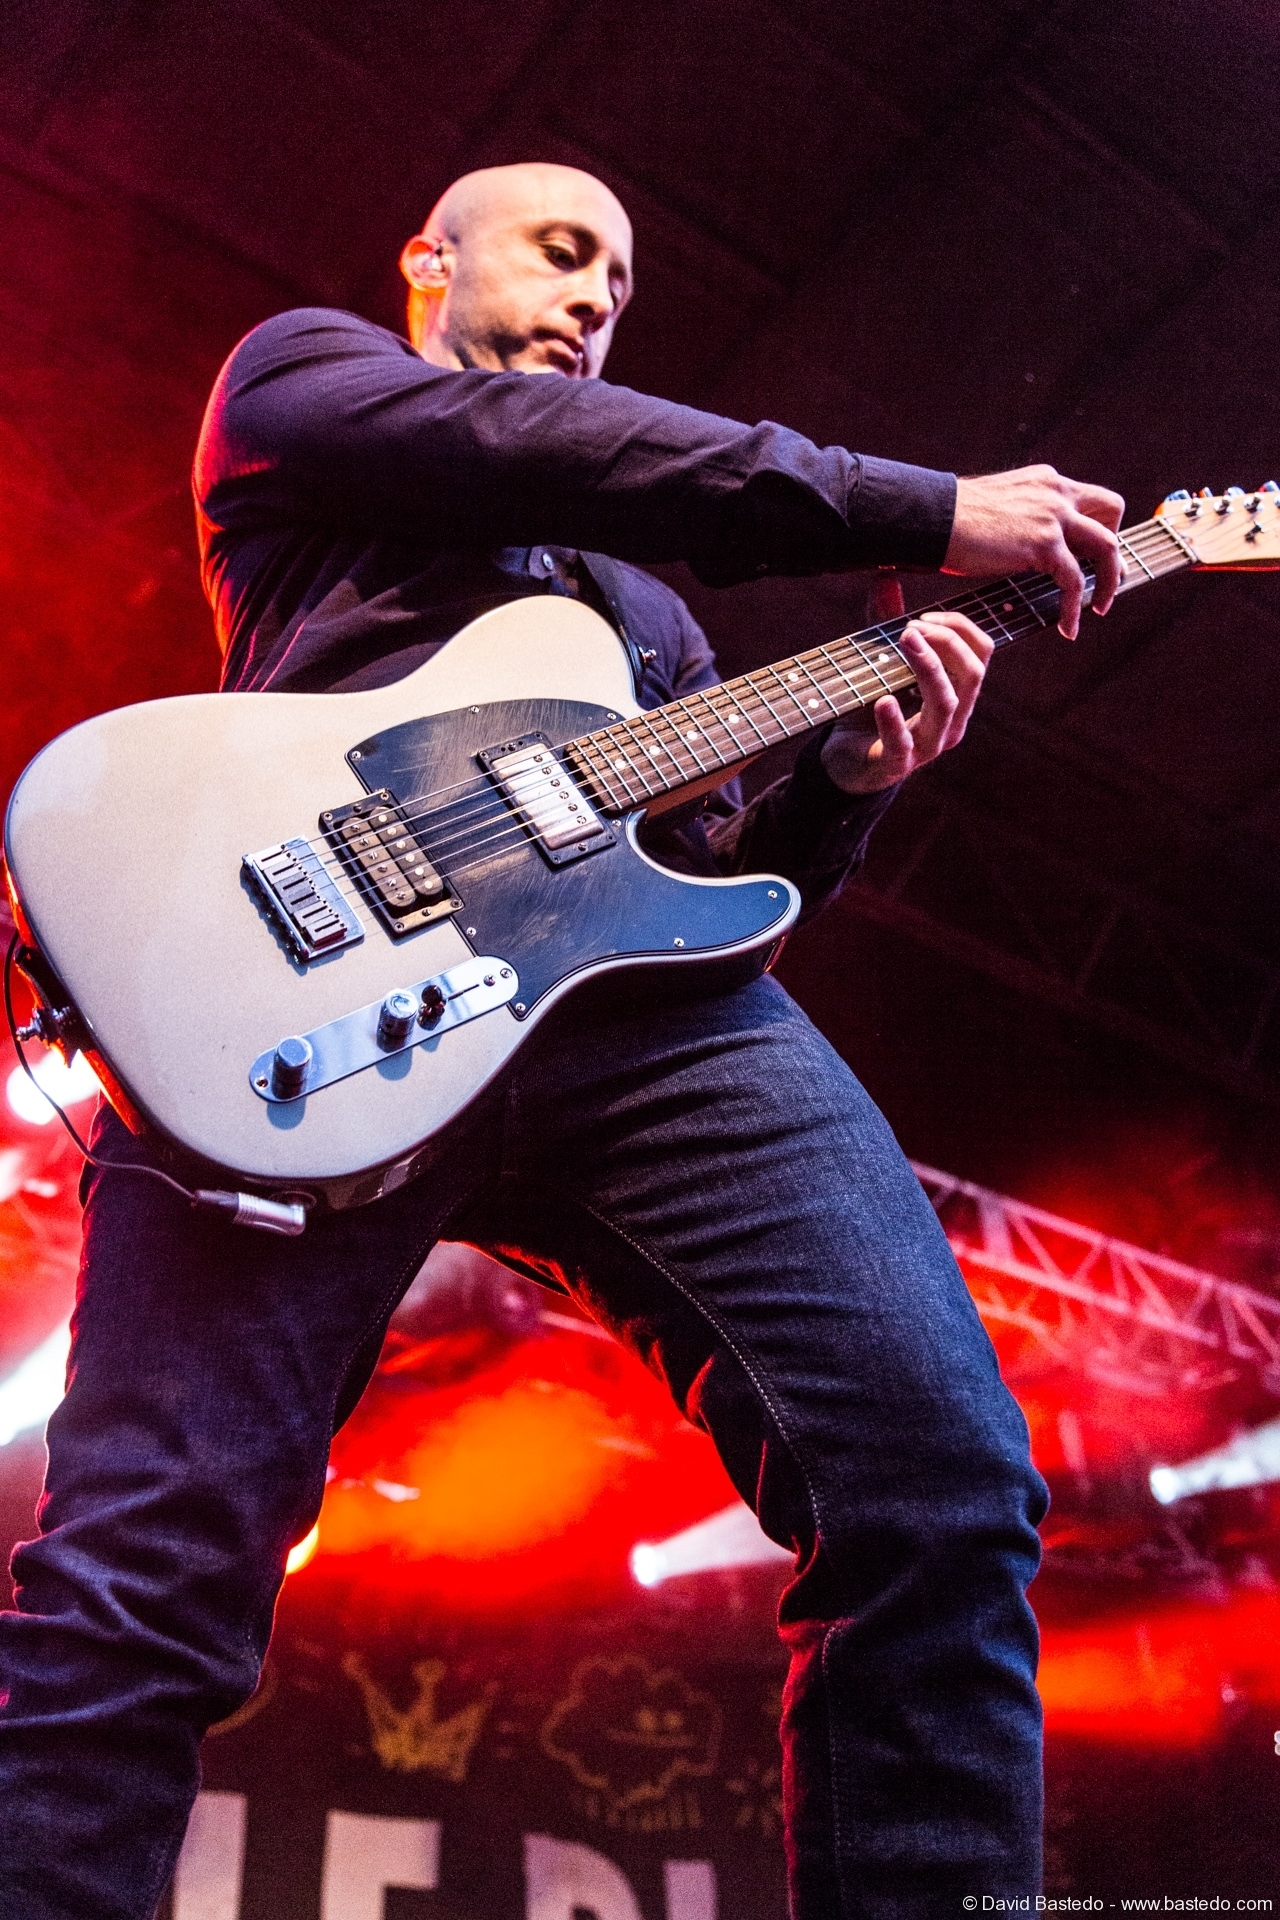 Jeff Stinco - Simple Plan - 2015